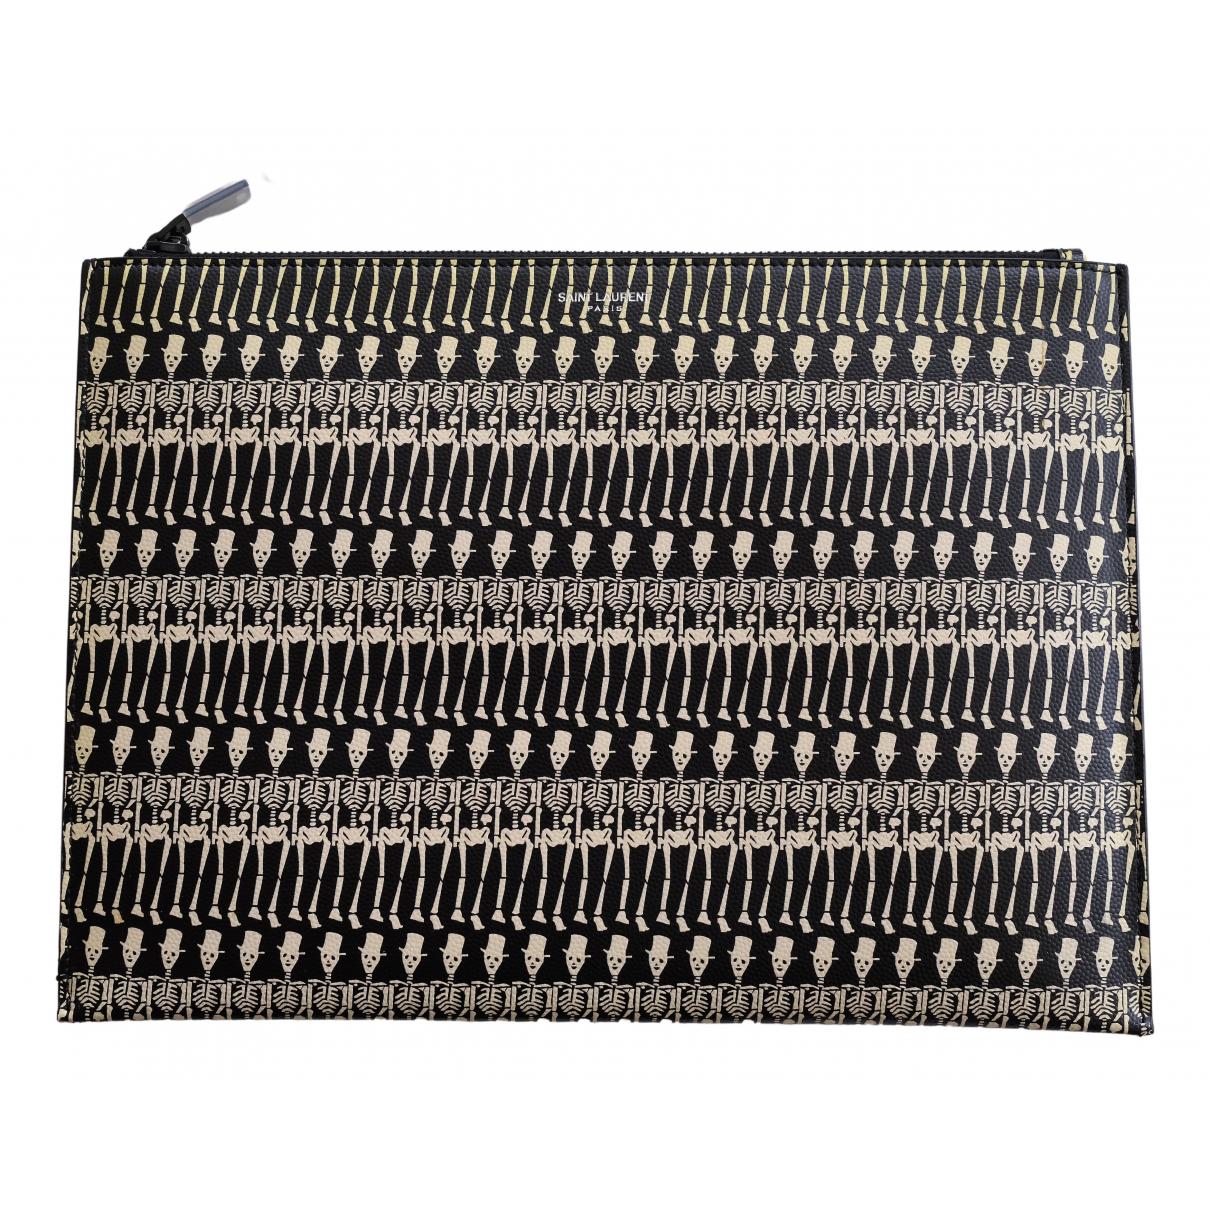 Saint Laurent N Leather Small bag, wallet & cases for Men N